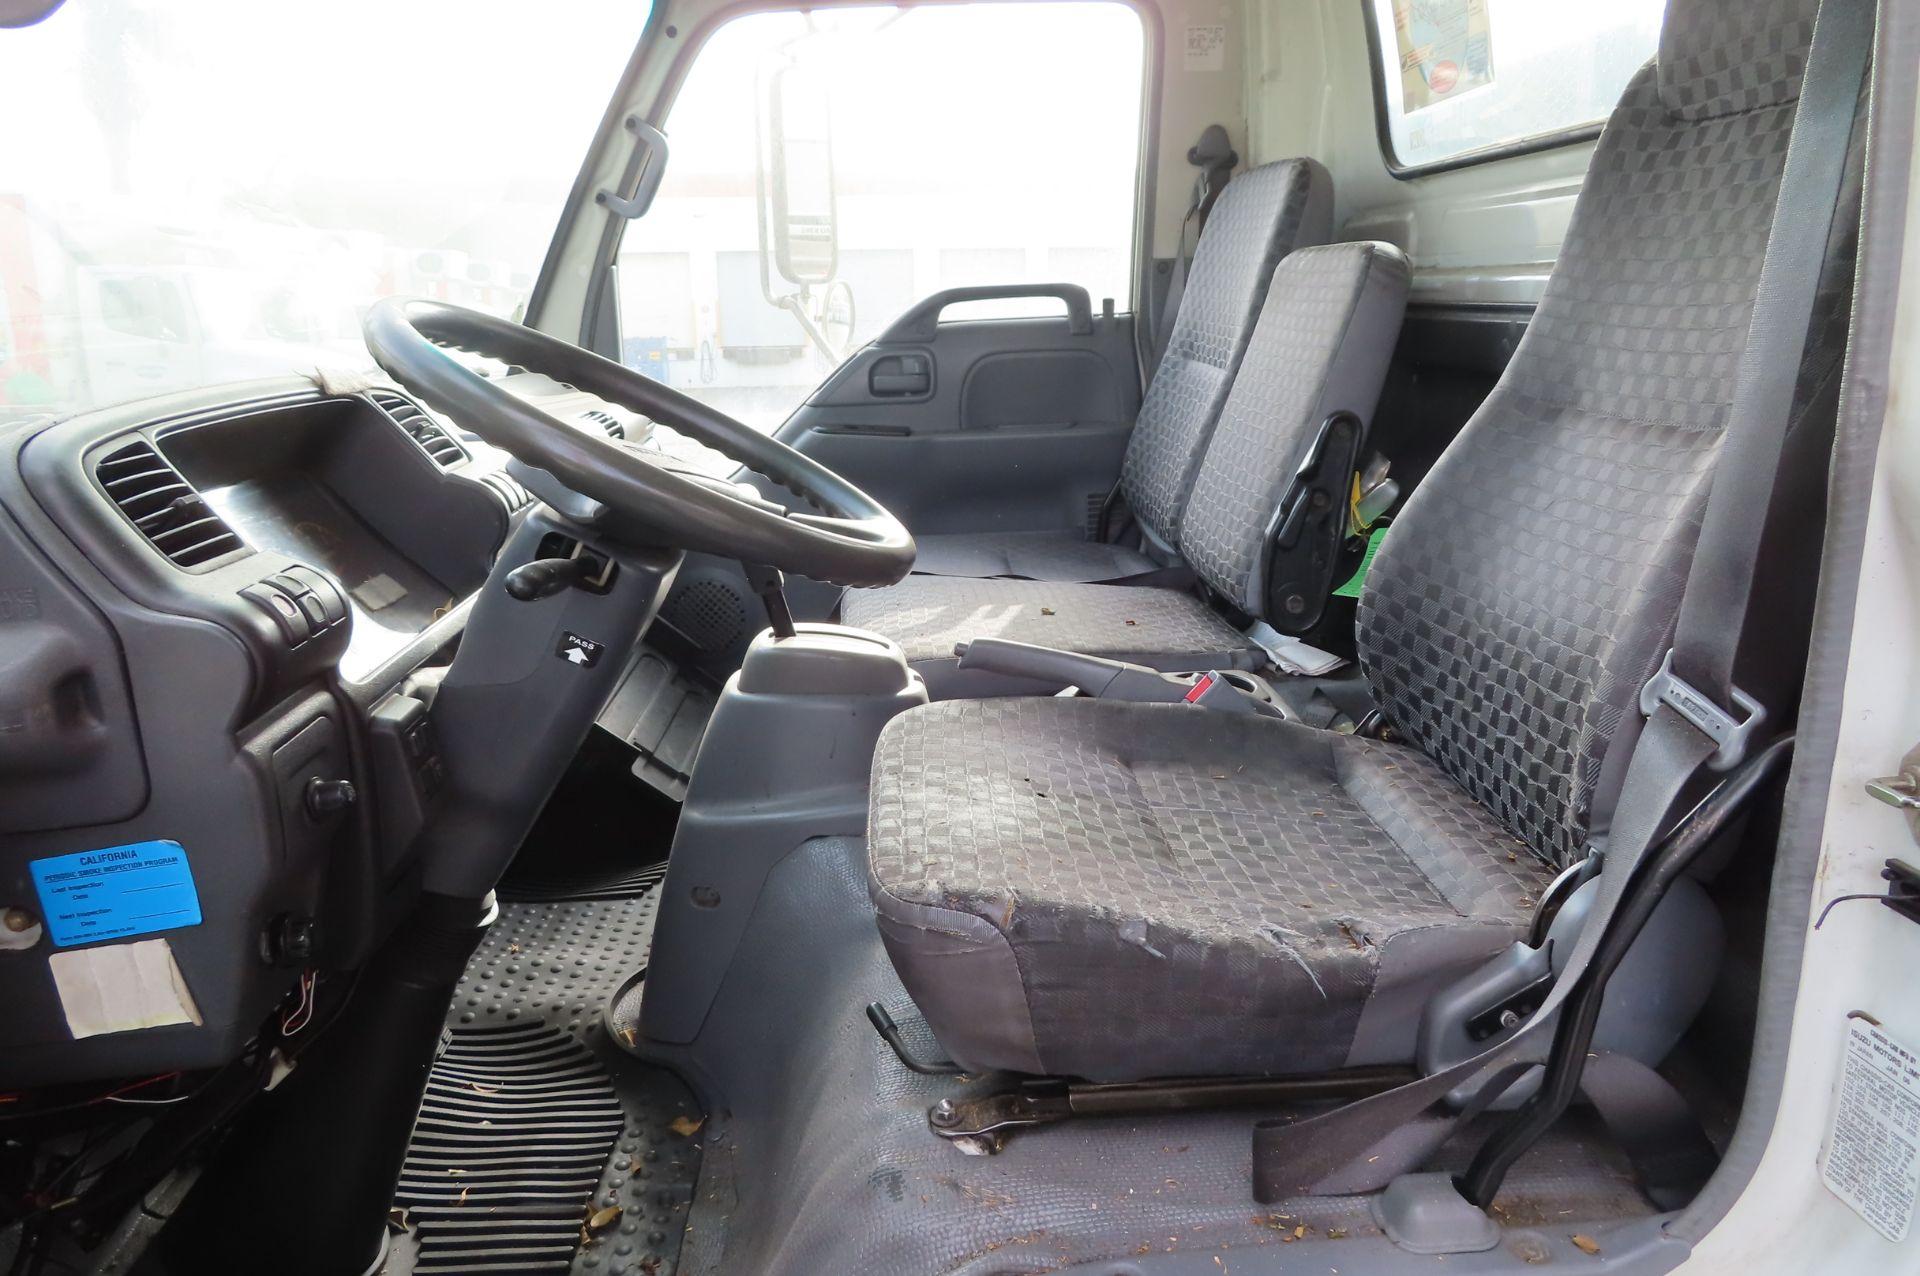 2006 Isuzu flat bed truck - Image 4 of 4